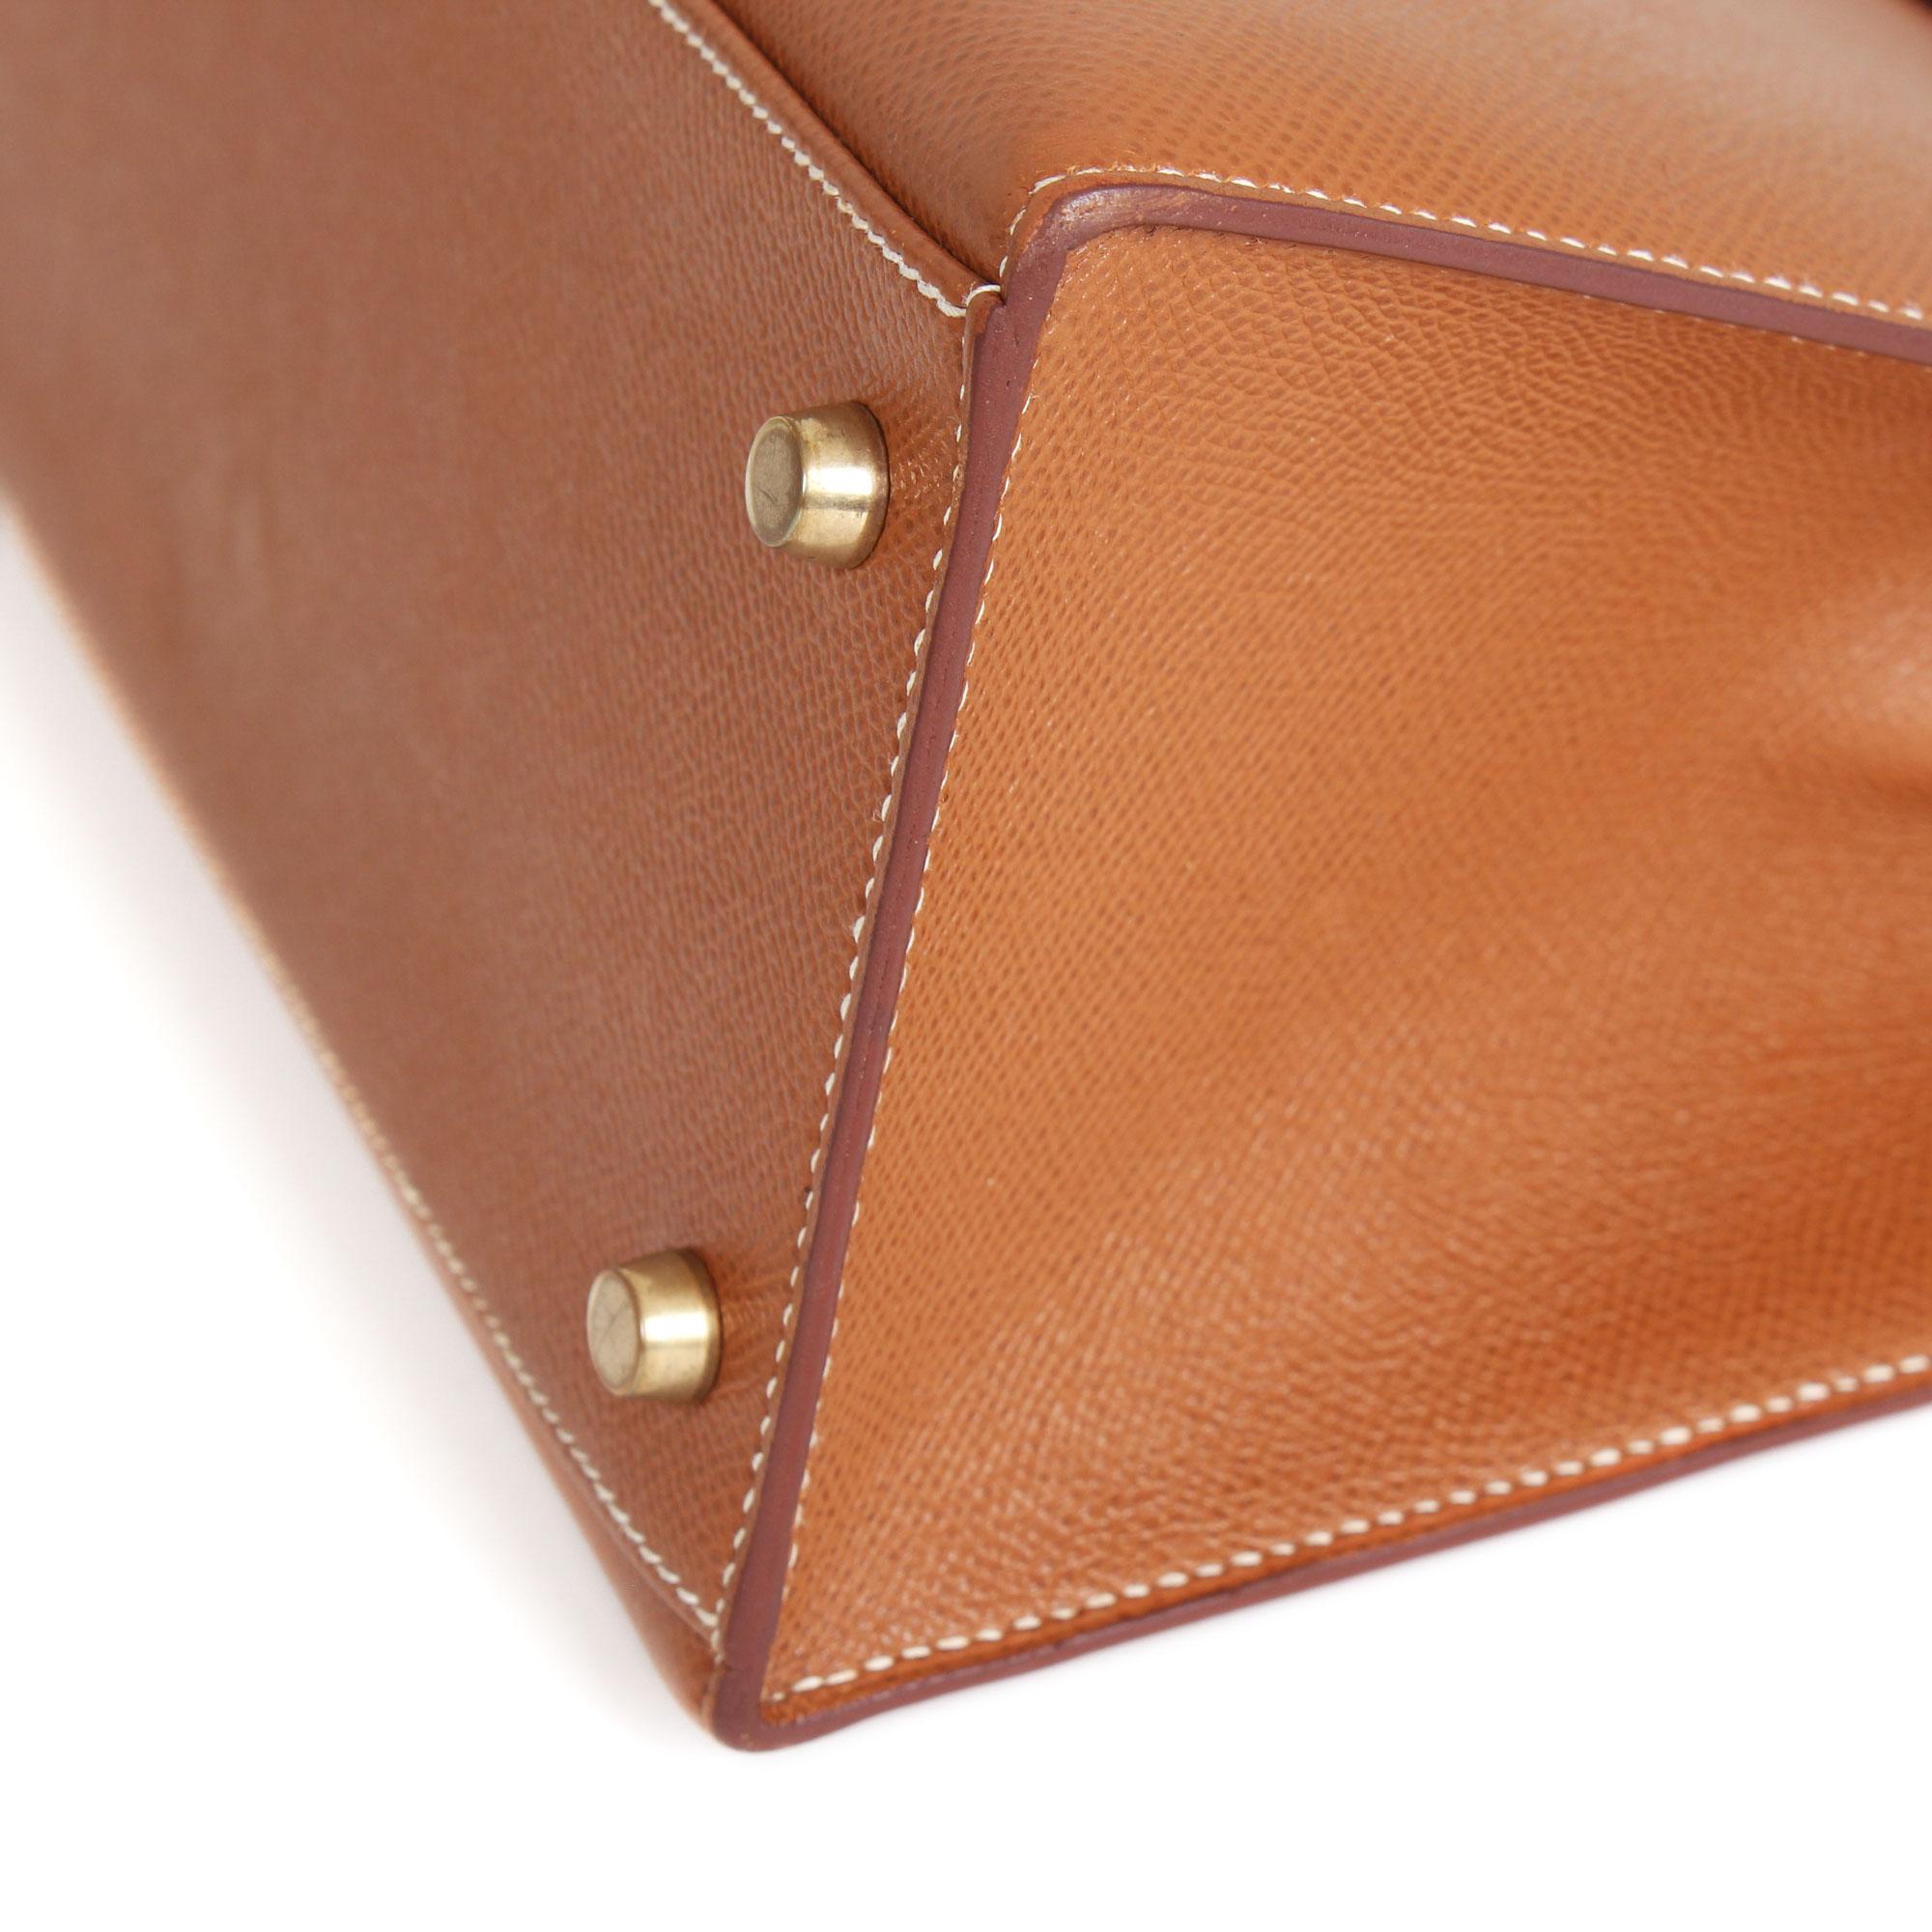 1de70c22cdfb Hermes Kelly 32 Gold Epsom leather handbag